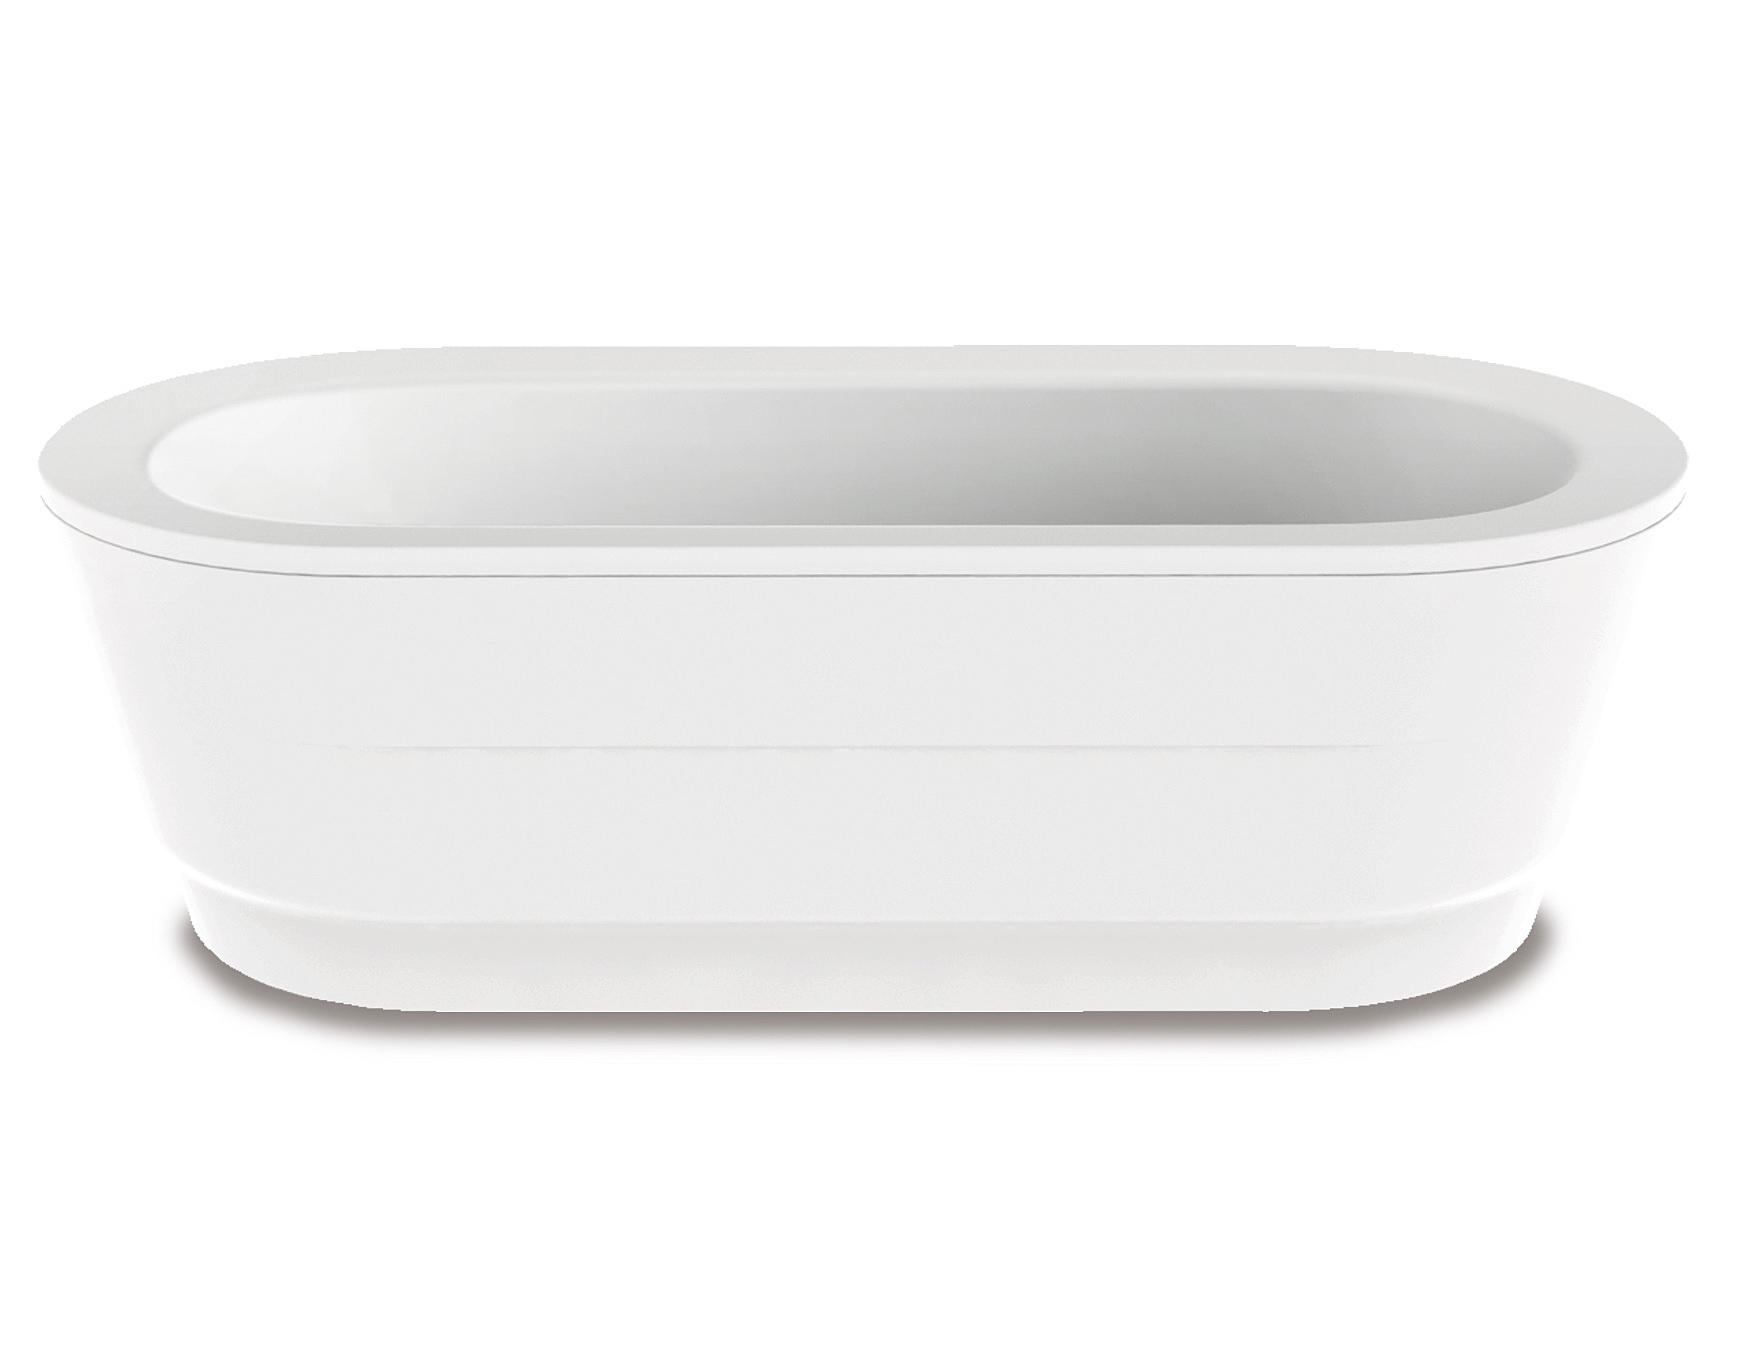 kaldewei classic duo oval wide 115 7 freestanding steel bath. Black Bedroom Furniture Sets. Home Design Ideas